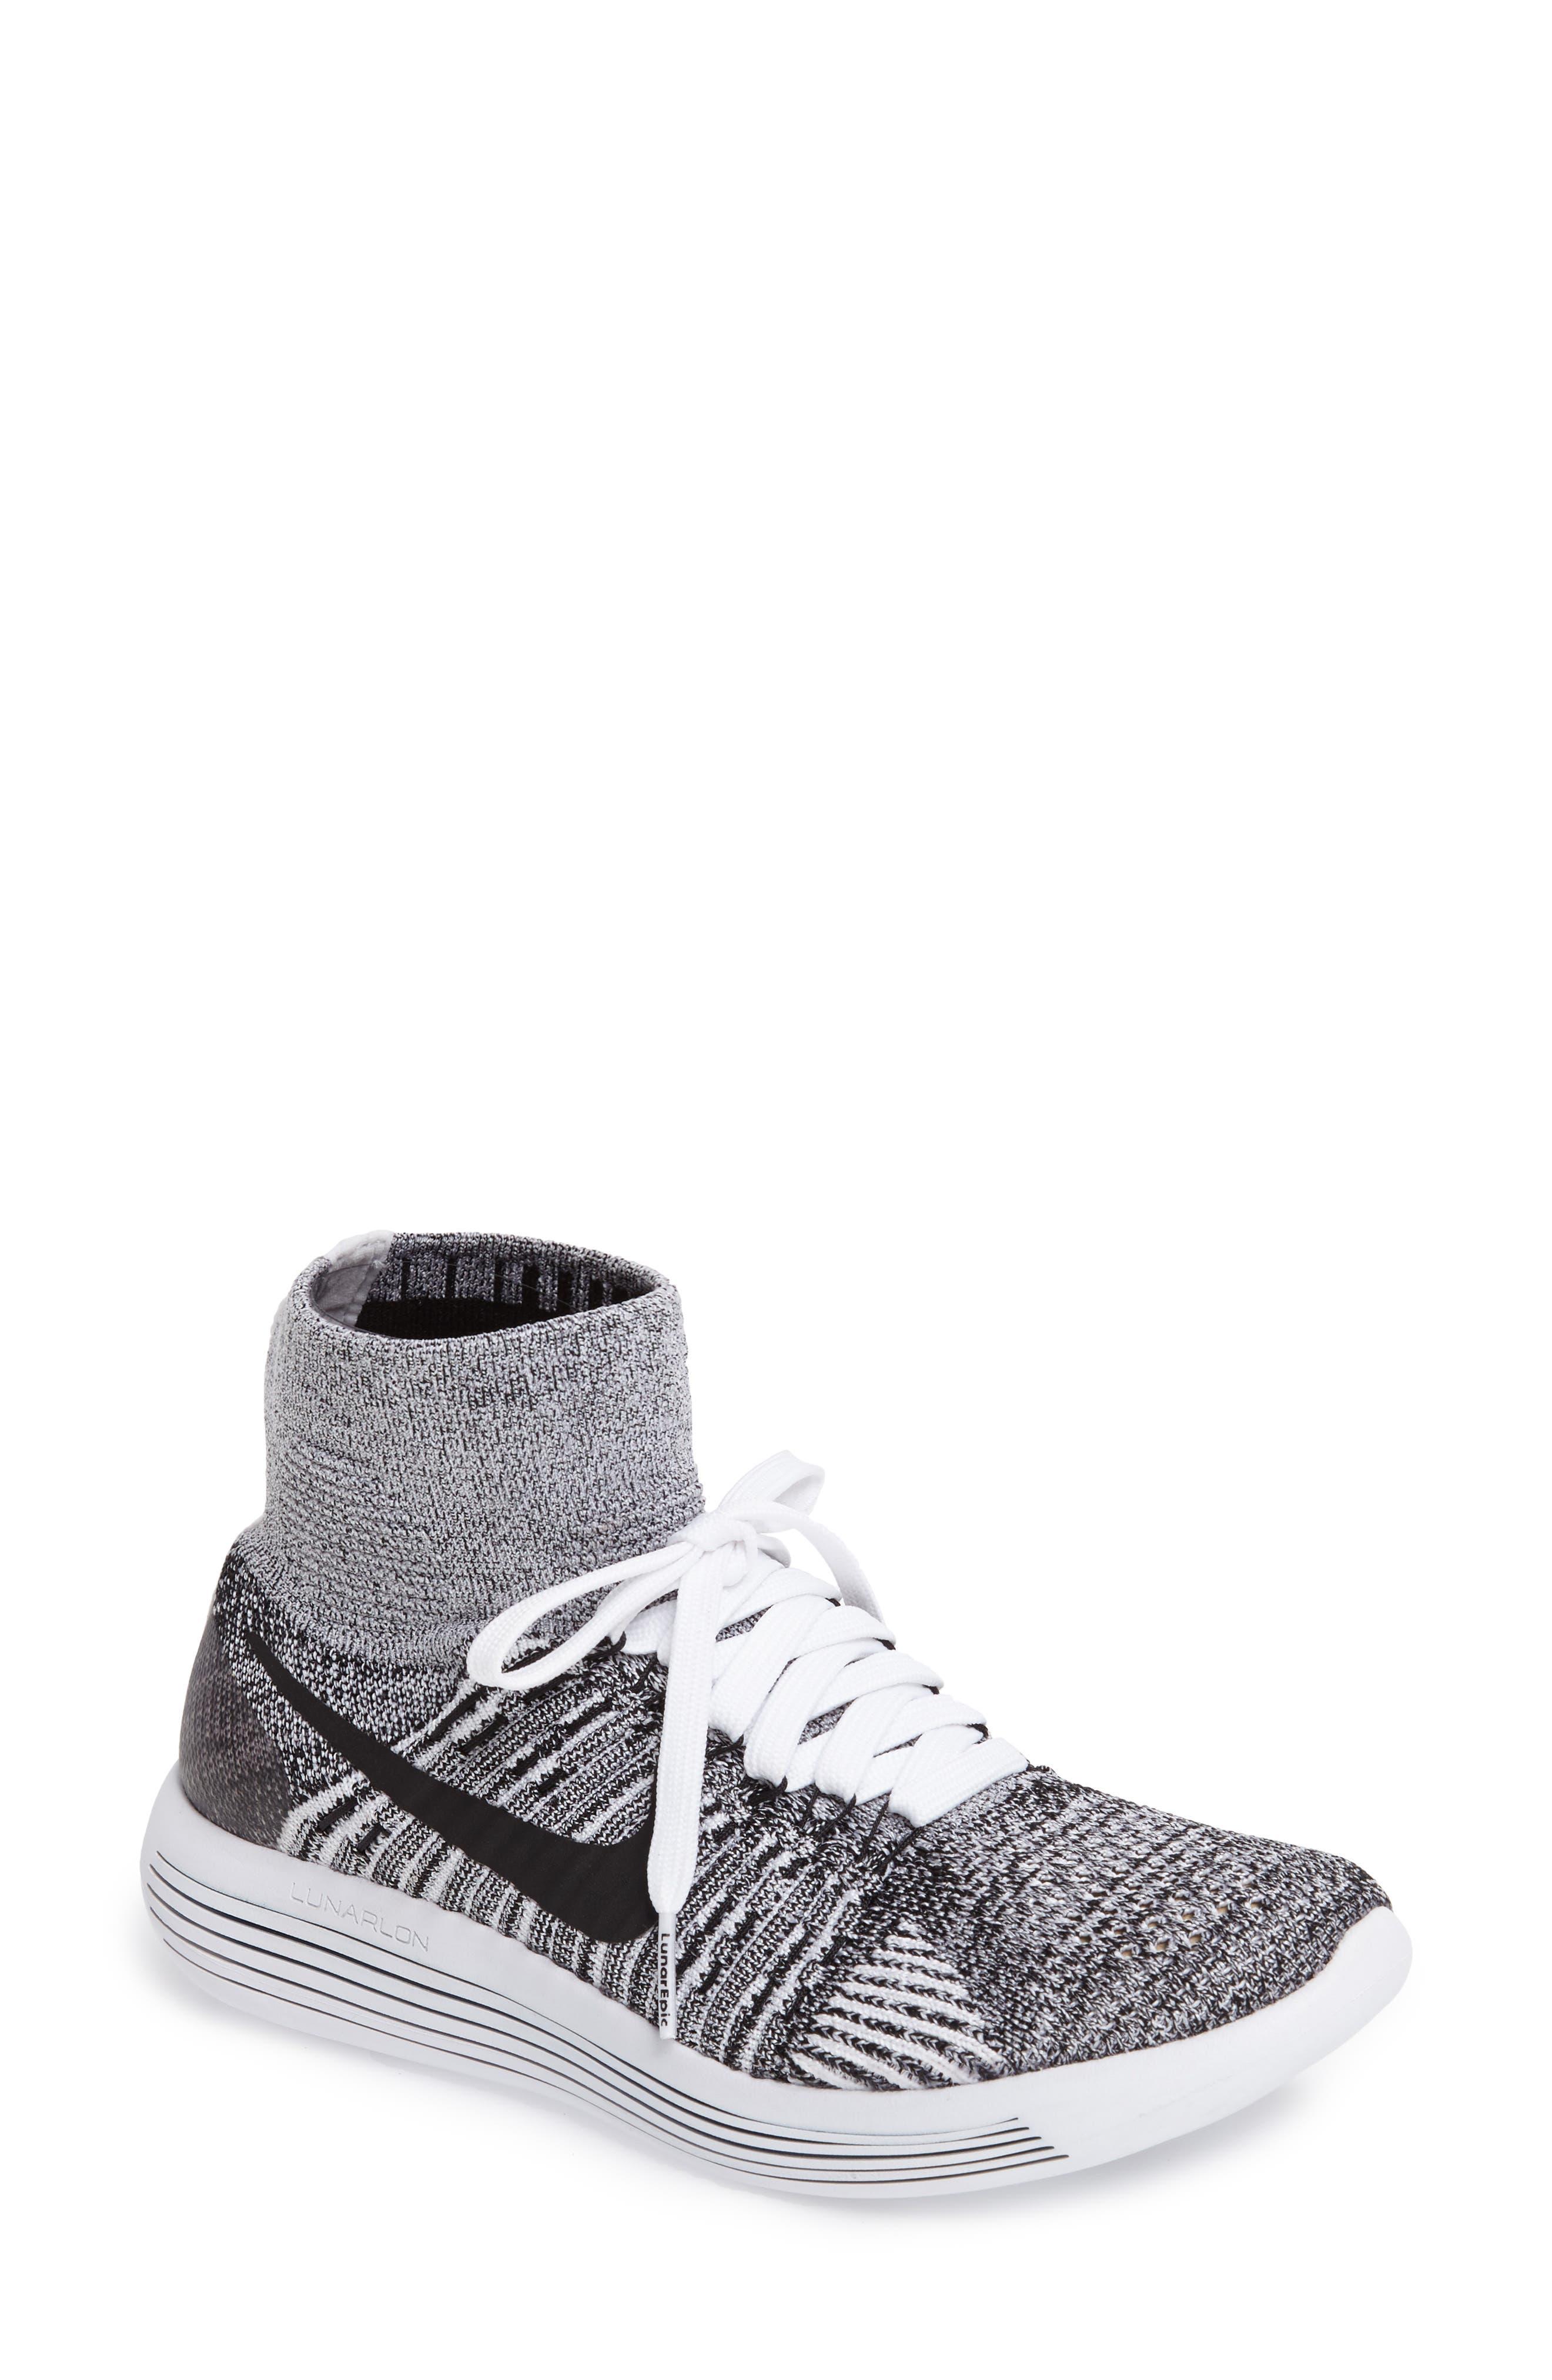 Nike LunarEpic Flyknit Running Shoe (Women)